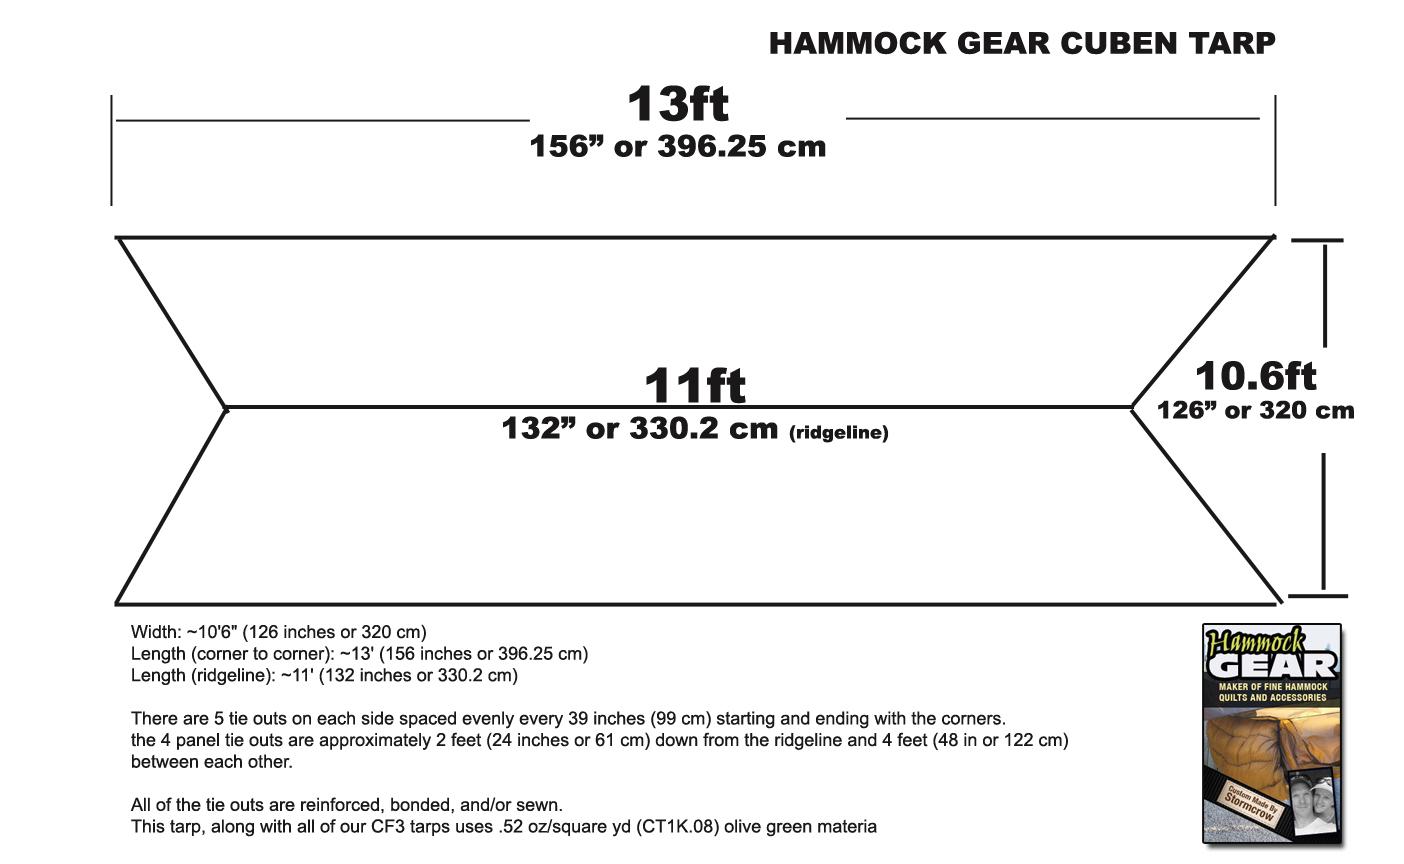 Hammock Tarp Hammock-gear-large-cuben-tarp